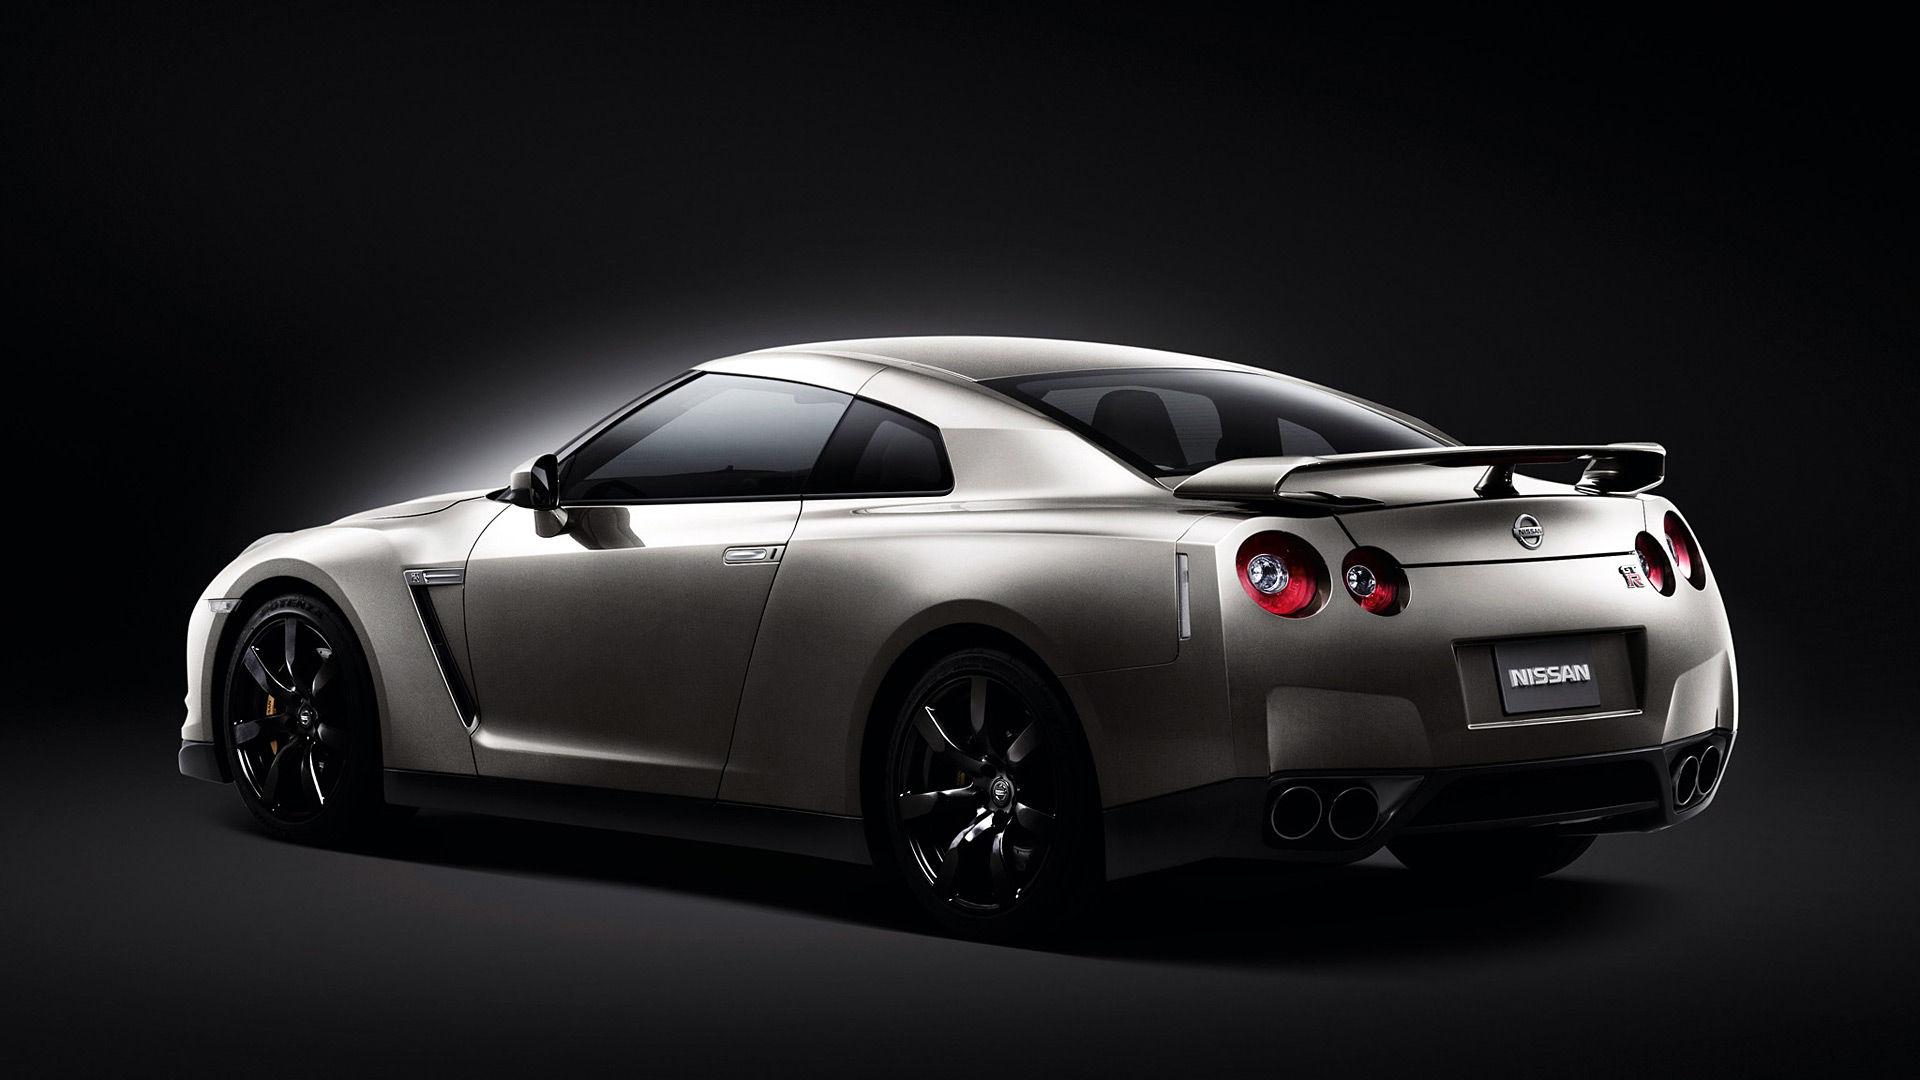 2008 Nissan GT-R Black Edition